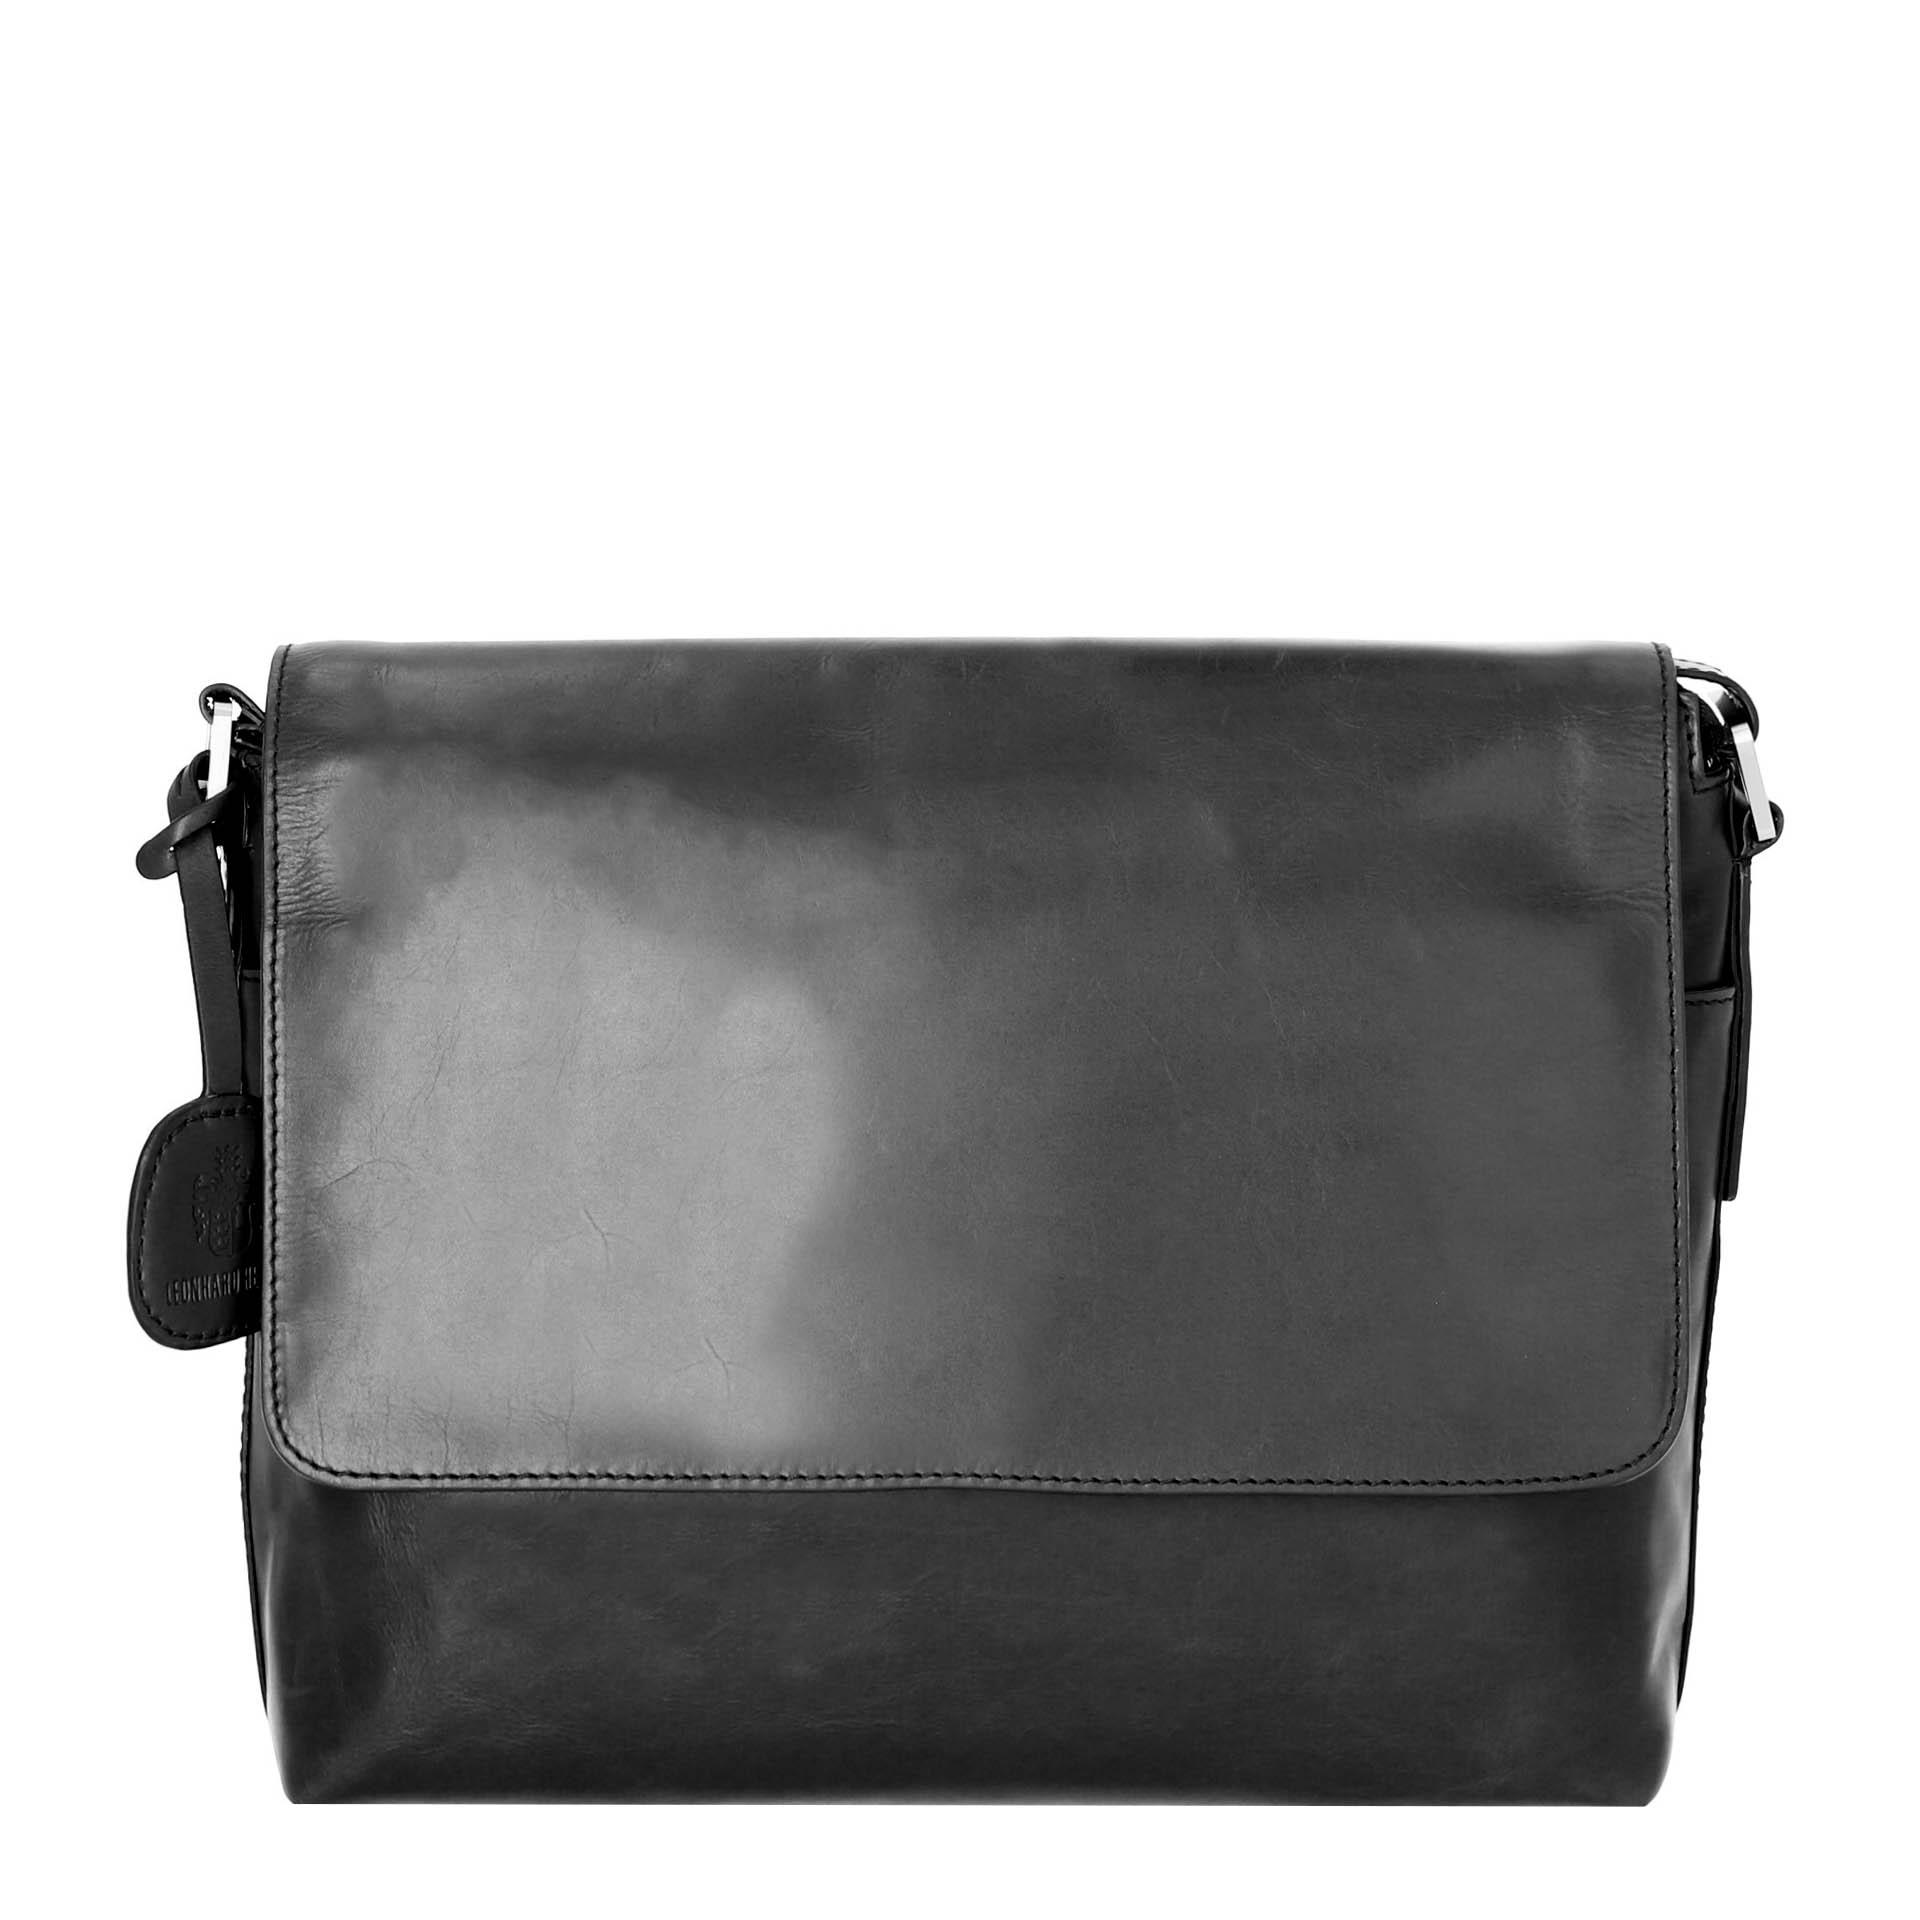 Leonhard Heyden Chelsea Handtasche schwarz